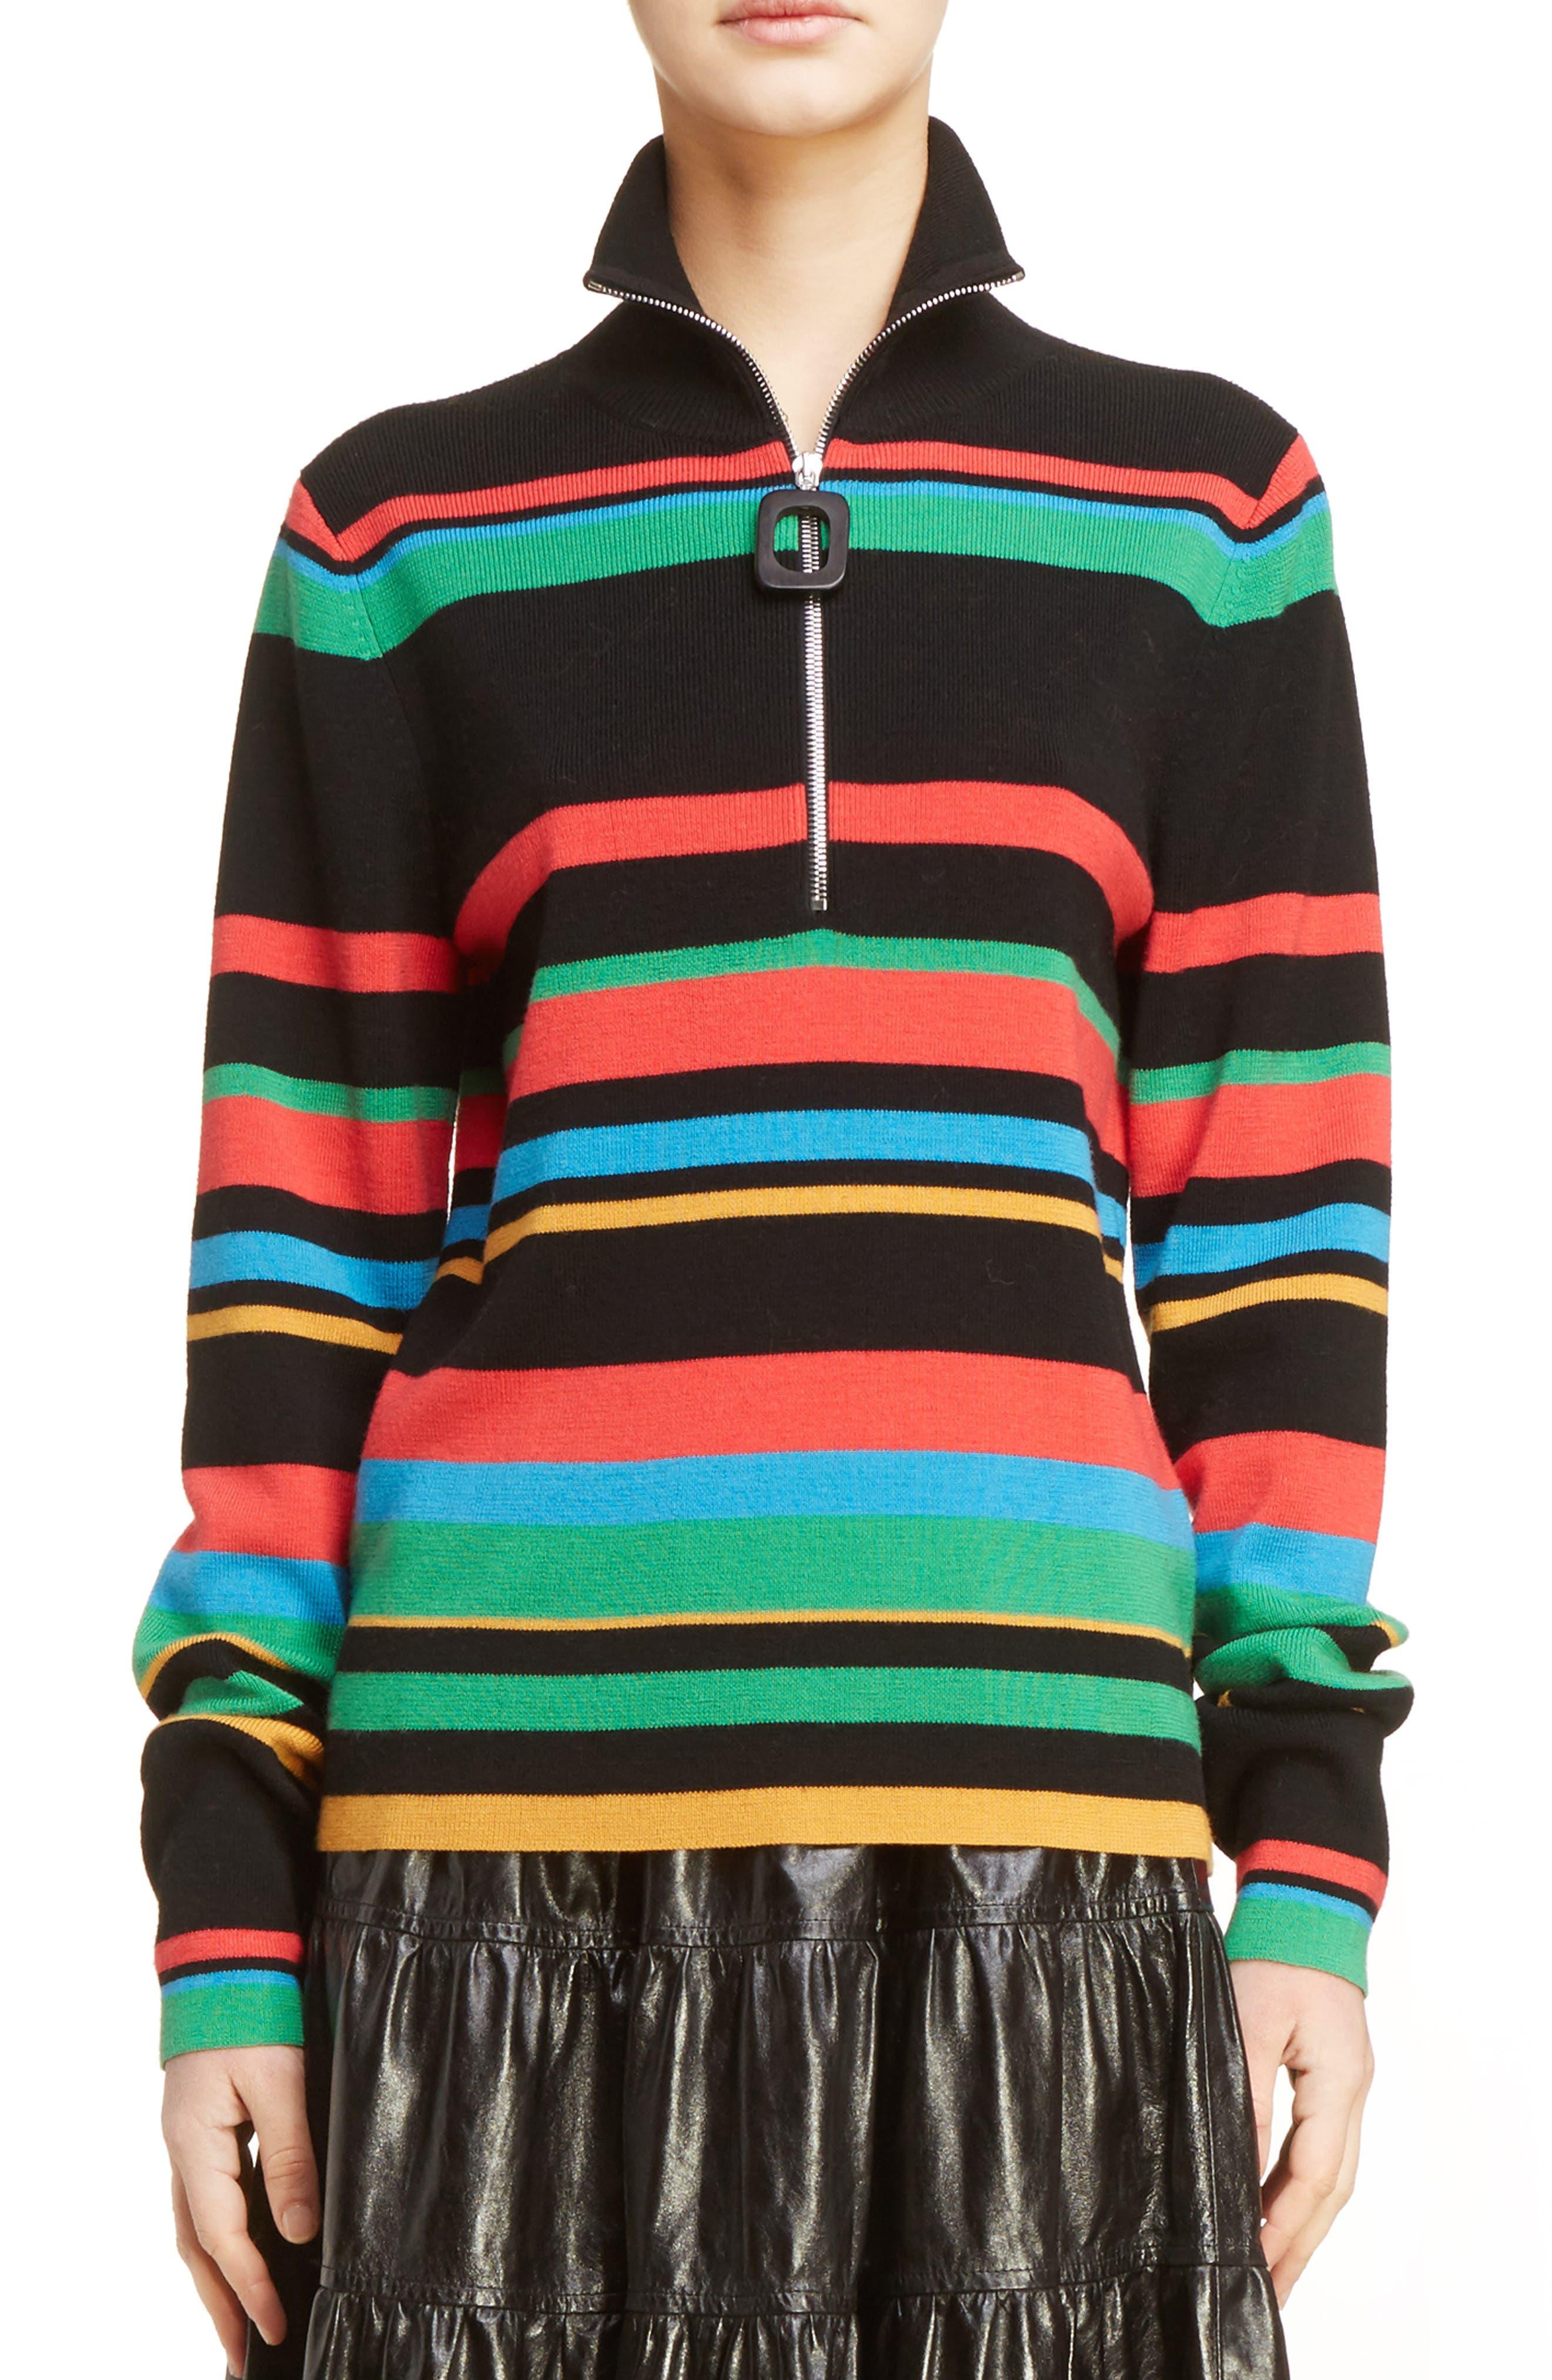 J.W.ANDERSON Stripe Half Zip Stretch Merino Wool Sweater